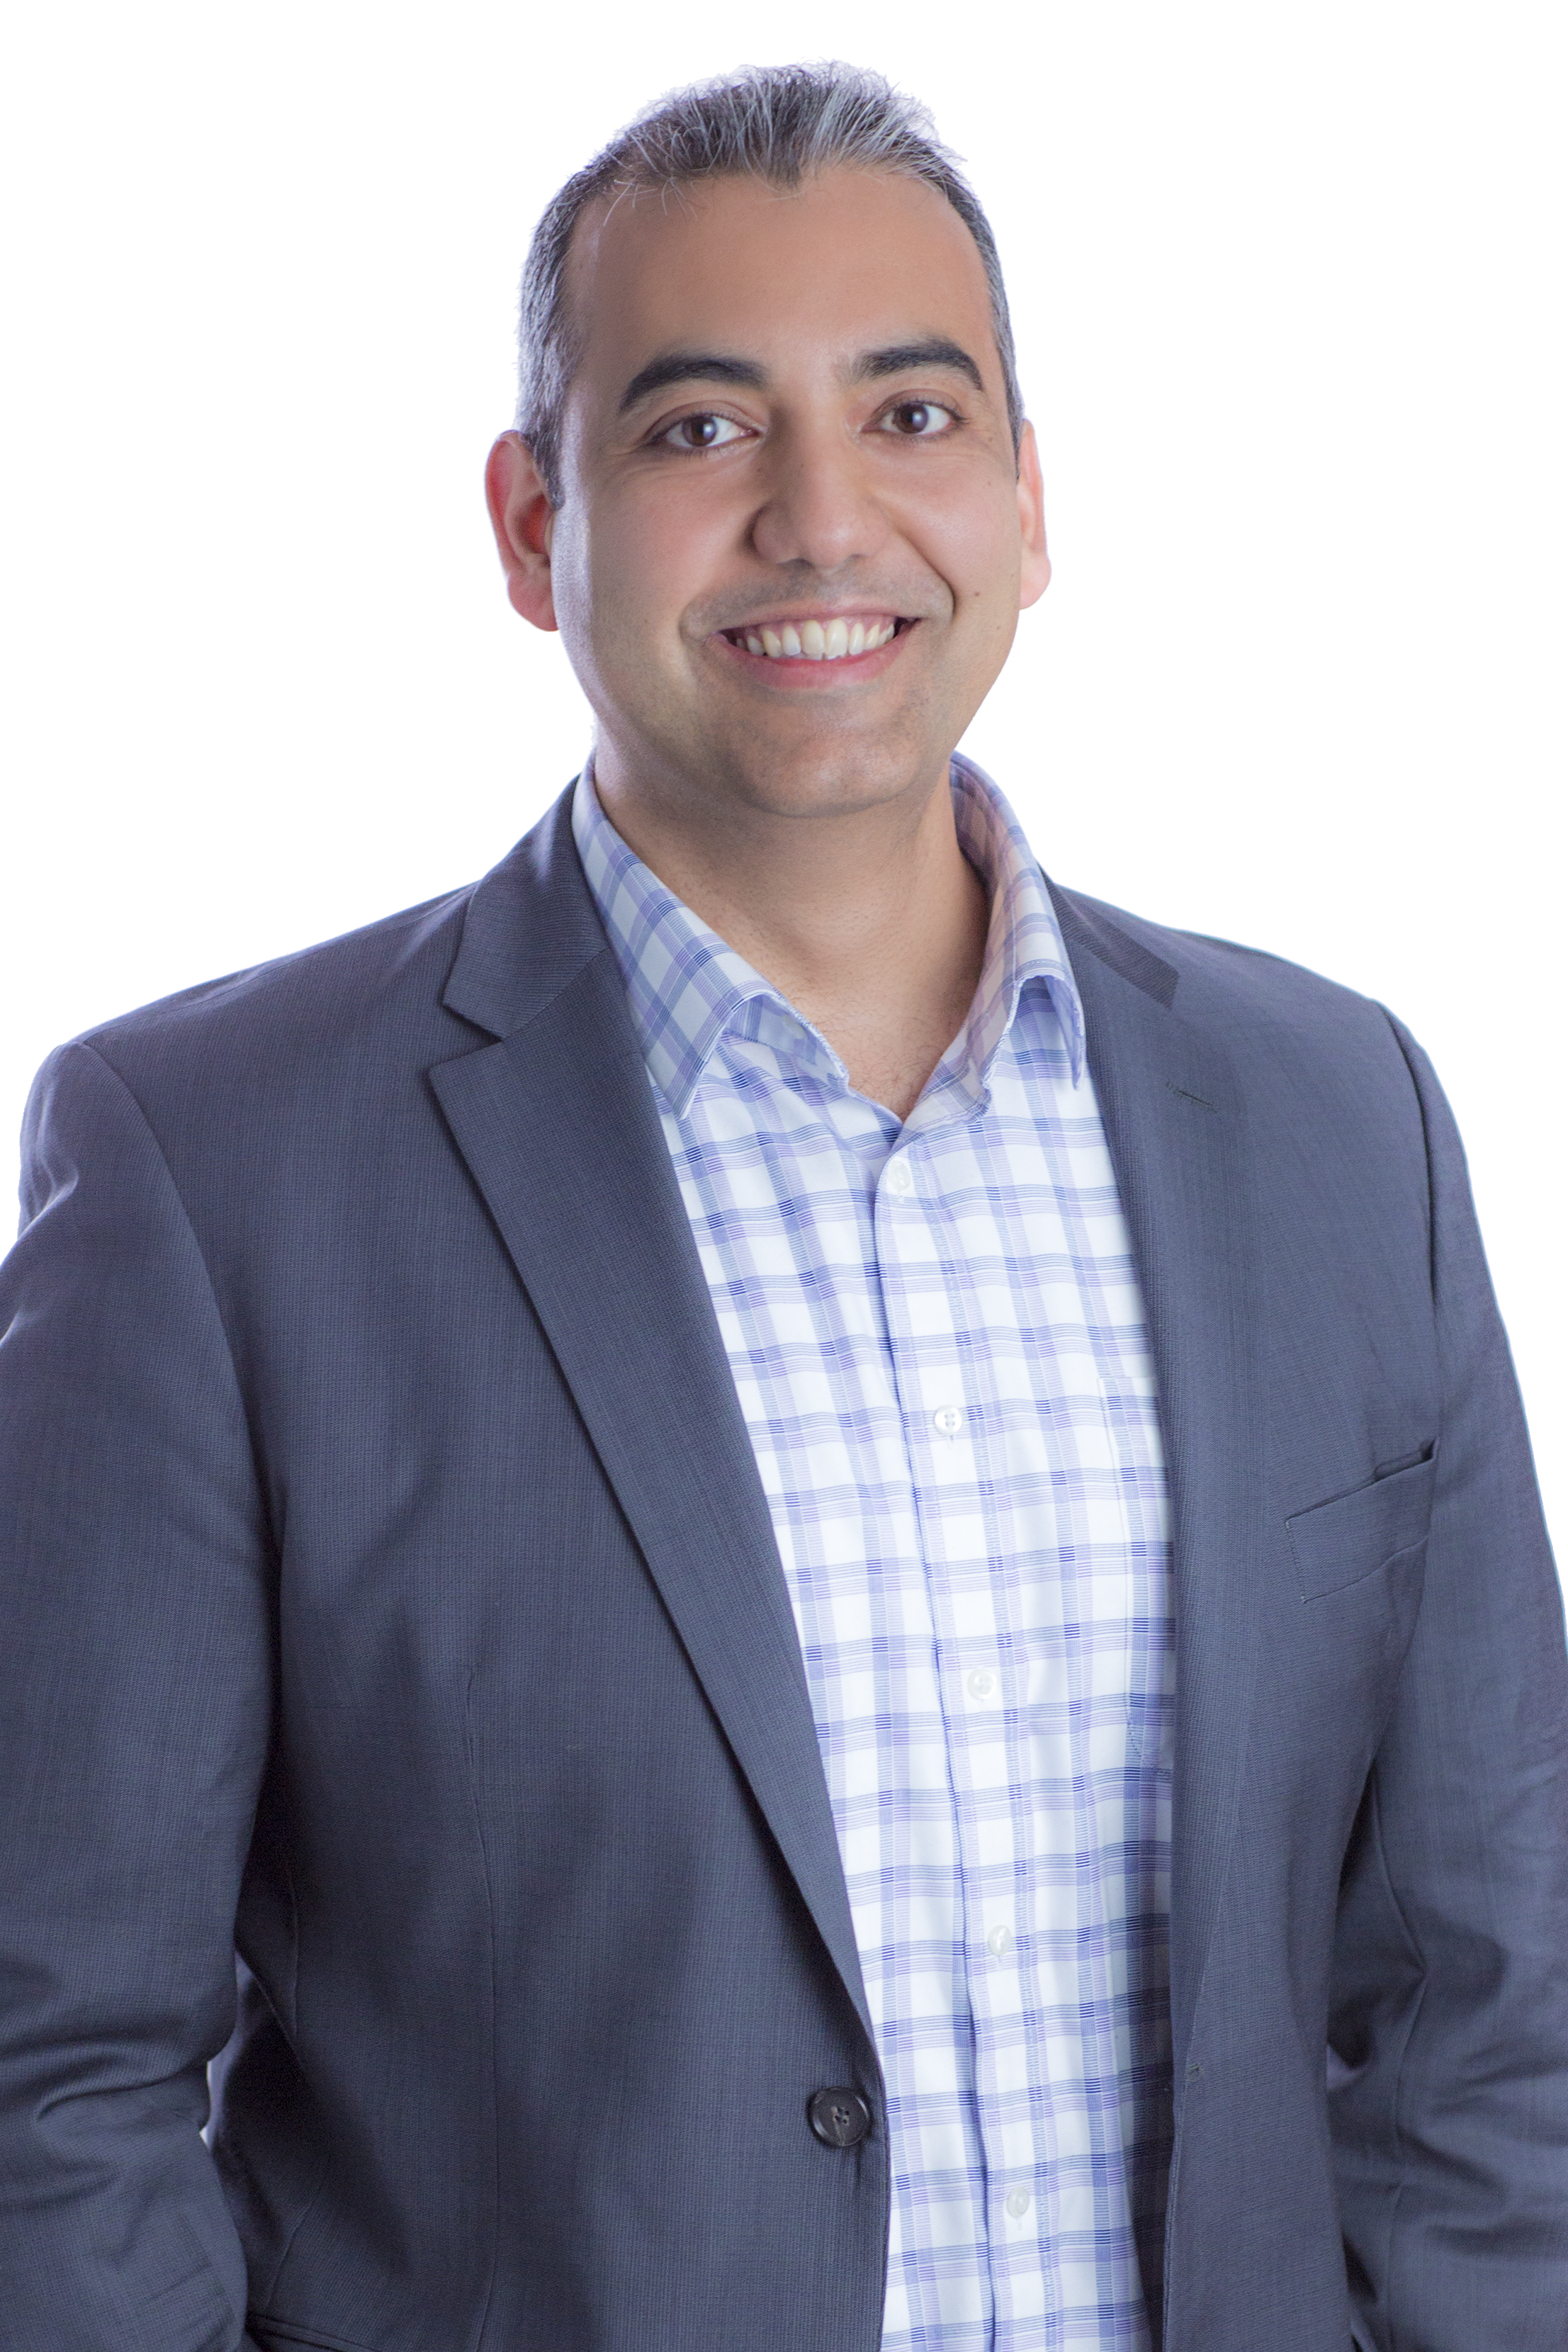 Co-CEO Bassam Al-Khalidi